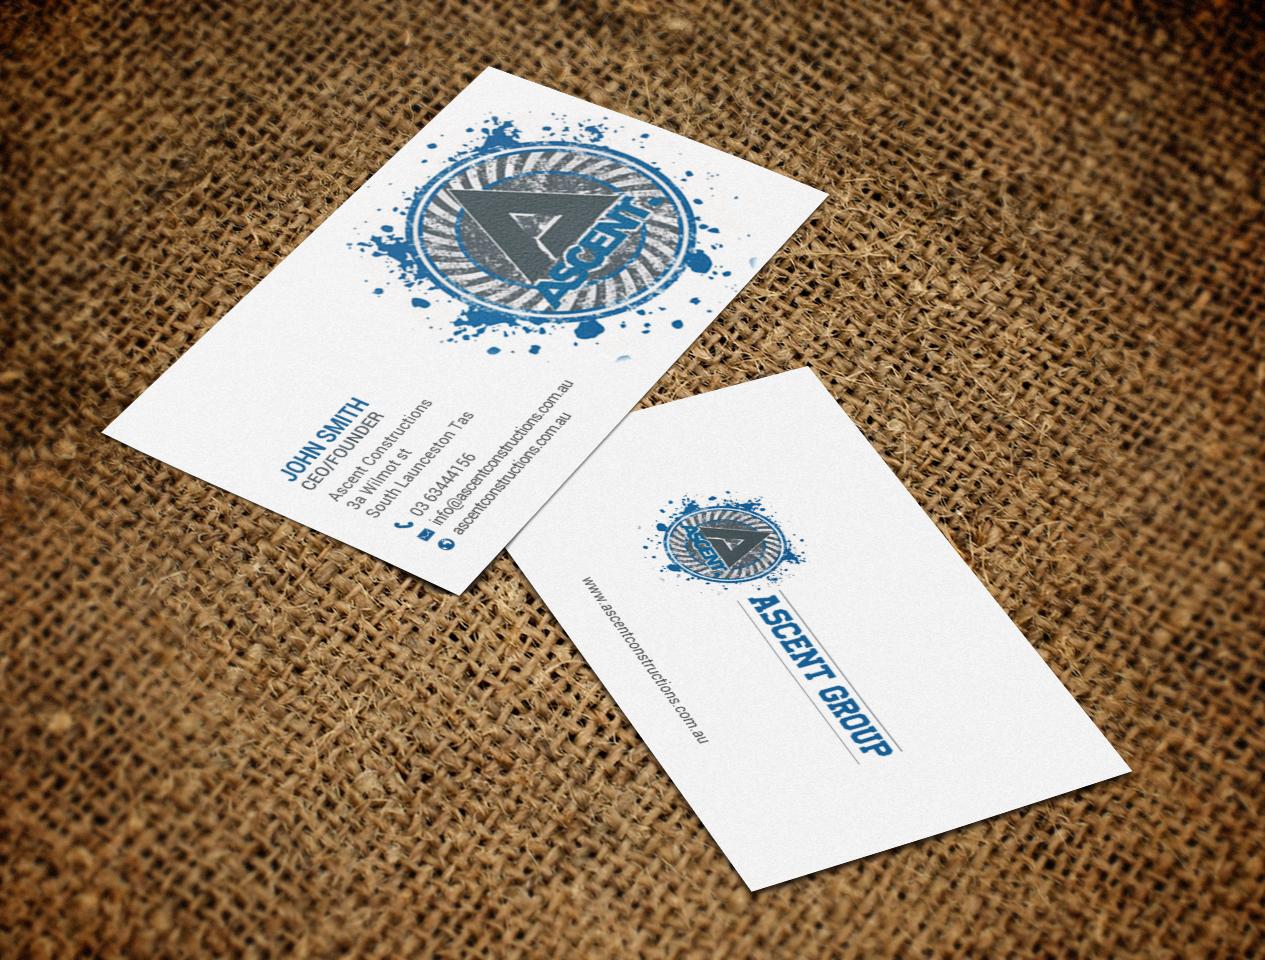 Bold modern construction company business card design for a bold modern construction company business card design for a company in australia design 17377617 reheart Choice Image